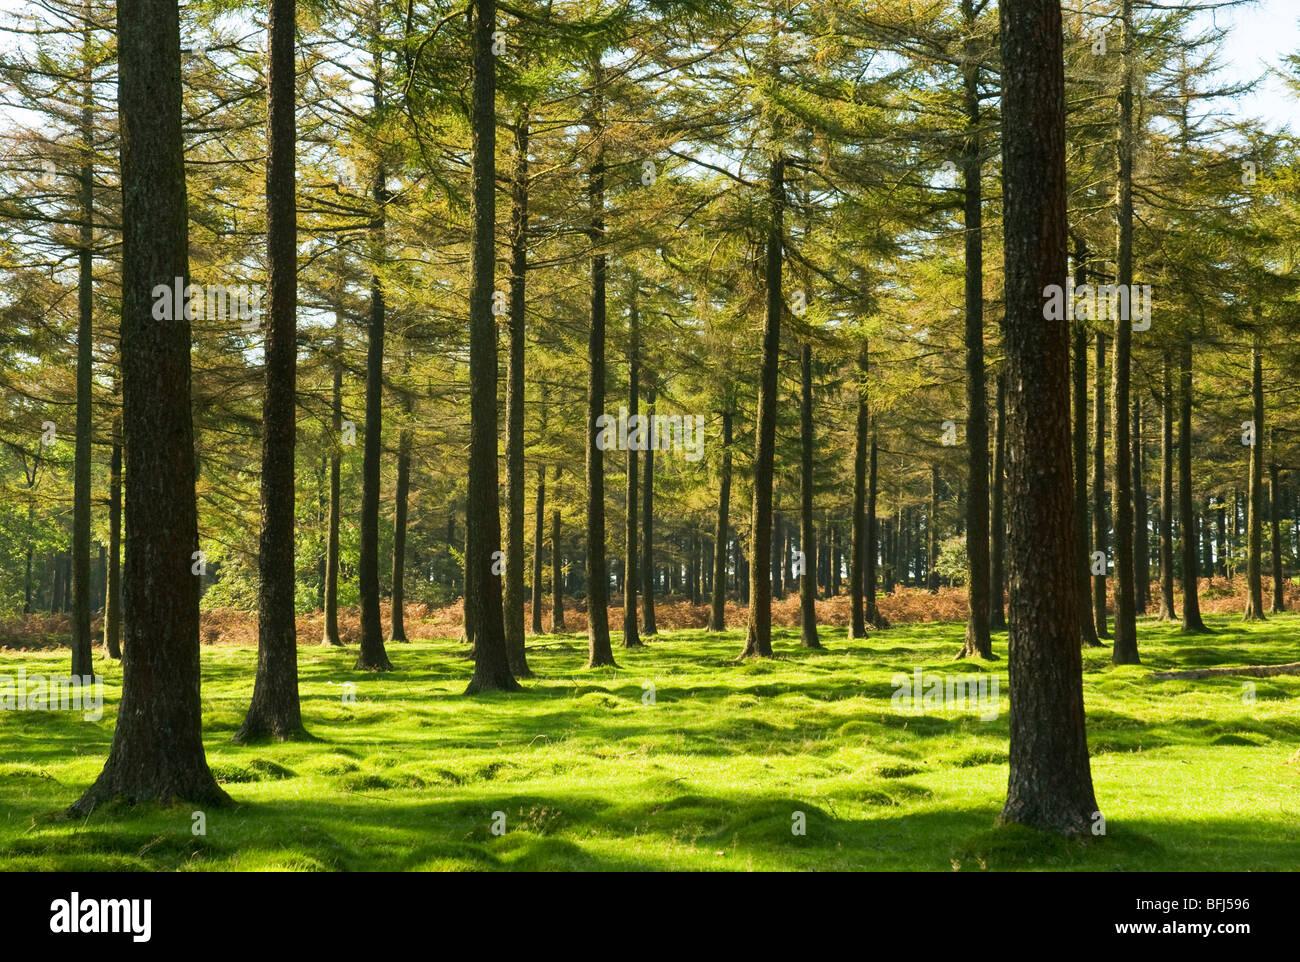 Clearing in a conifer wood, Dartmoor, Devon UK Stock Photo